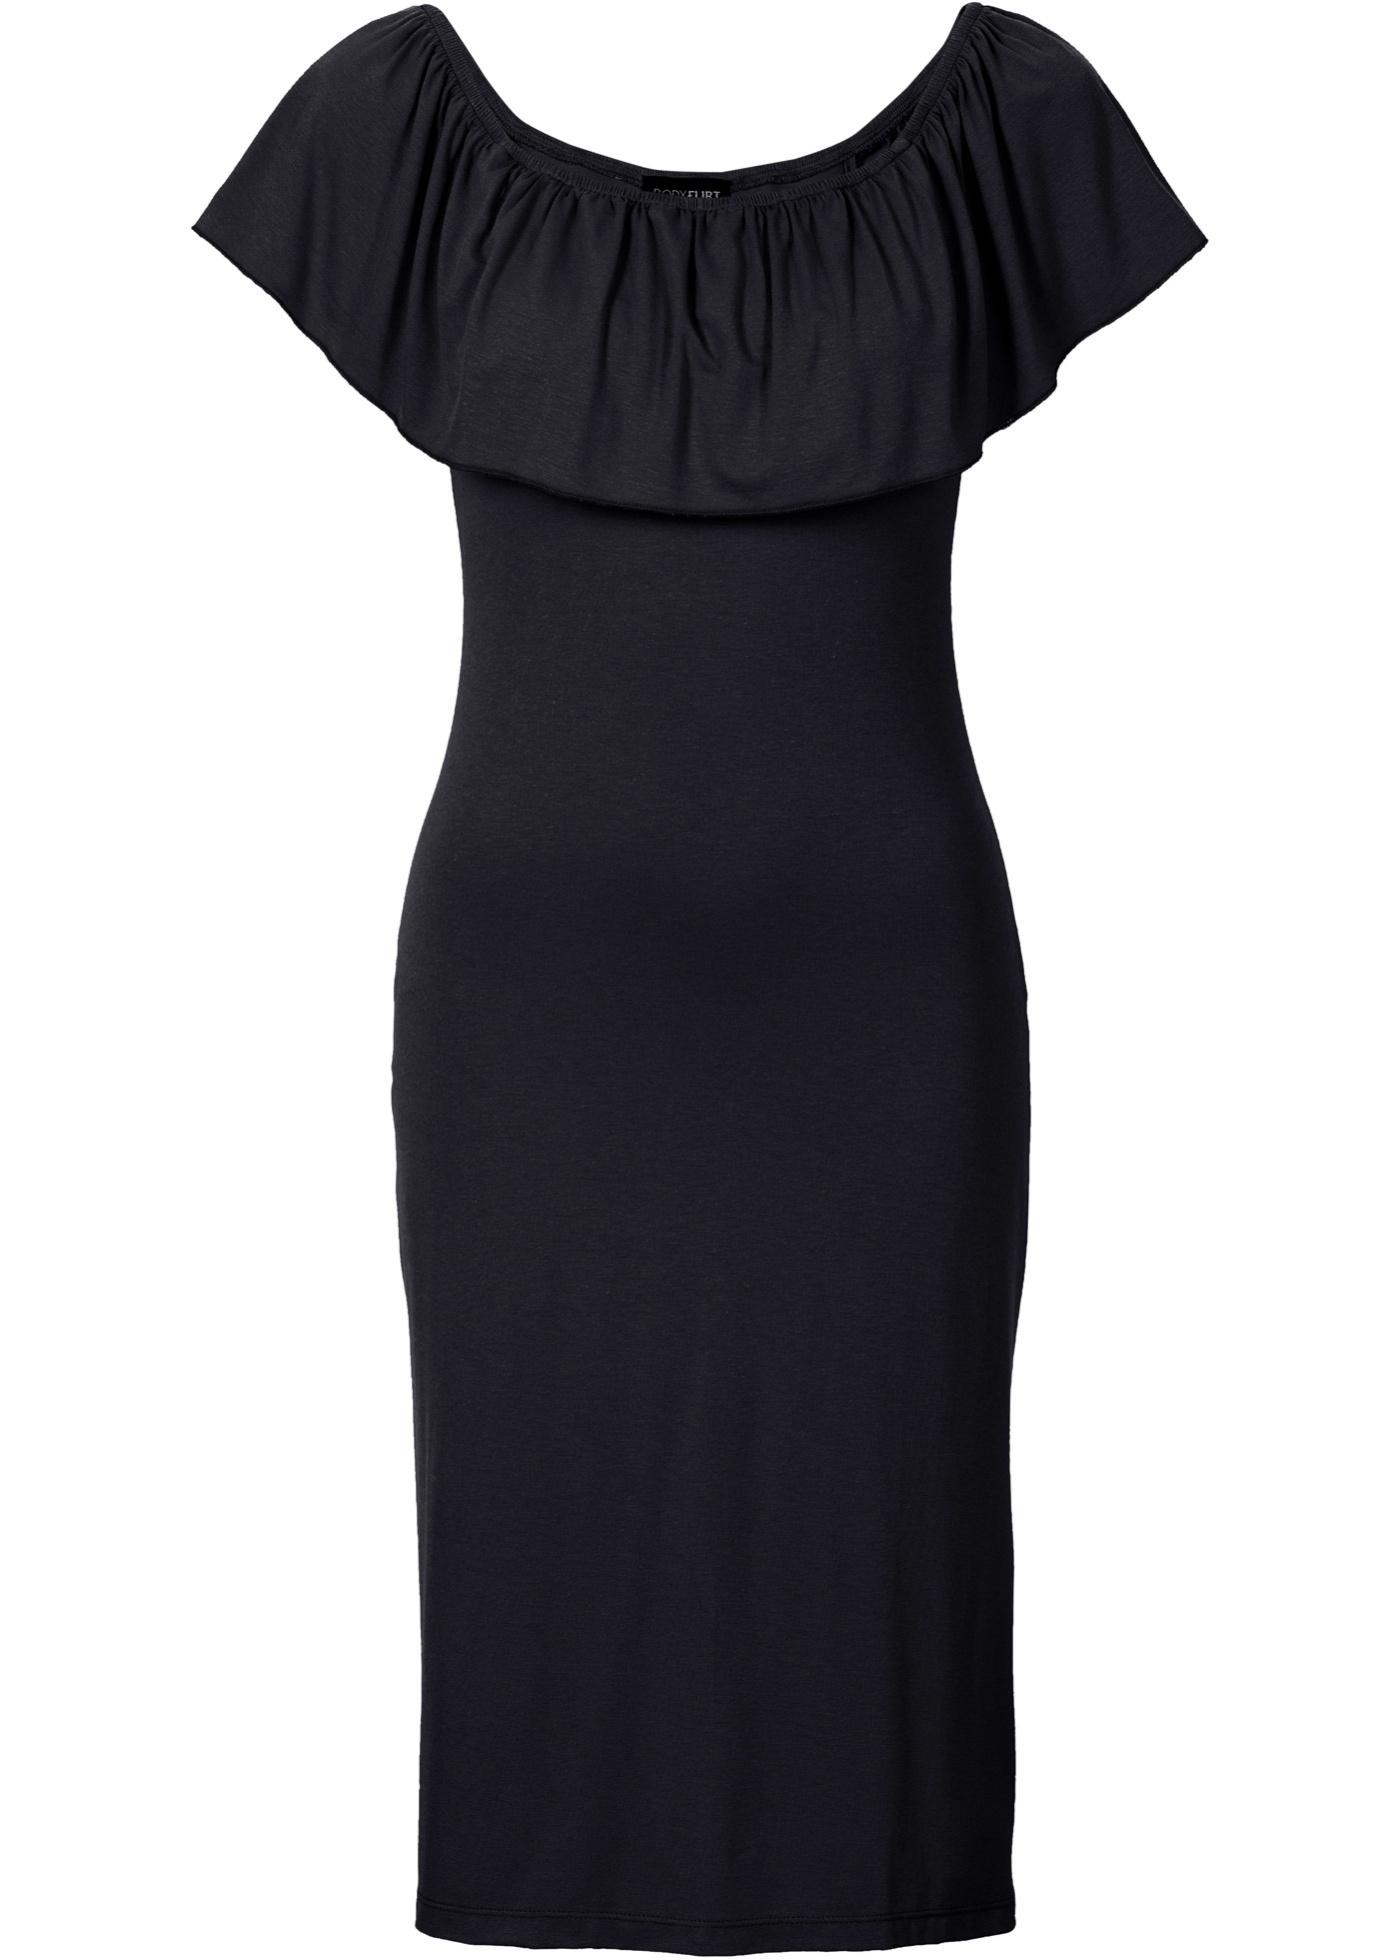 Festtagsmode - Sommer Carmen Kleid aus Jersey › bonprix › schwarz  - Onlineshop Bonprix